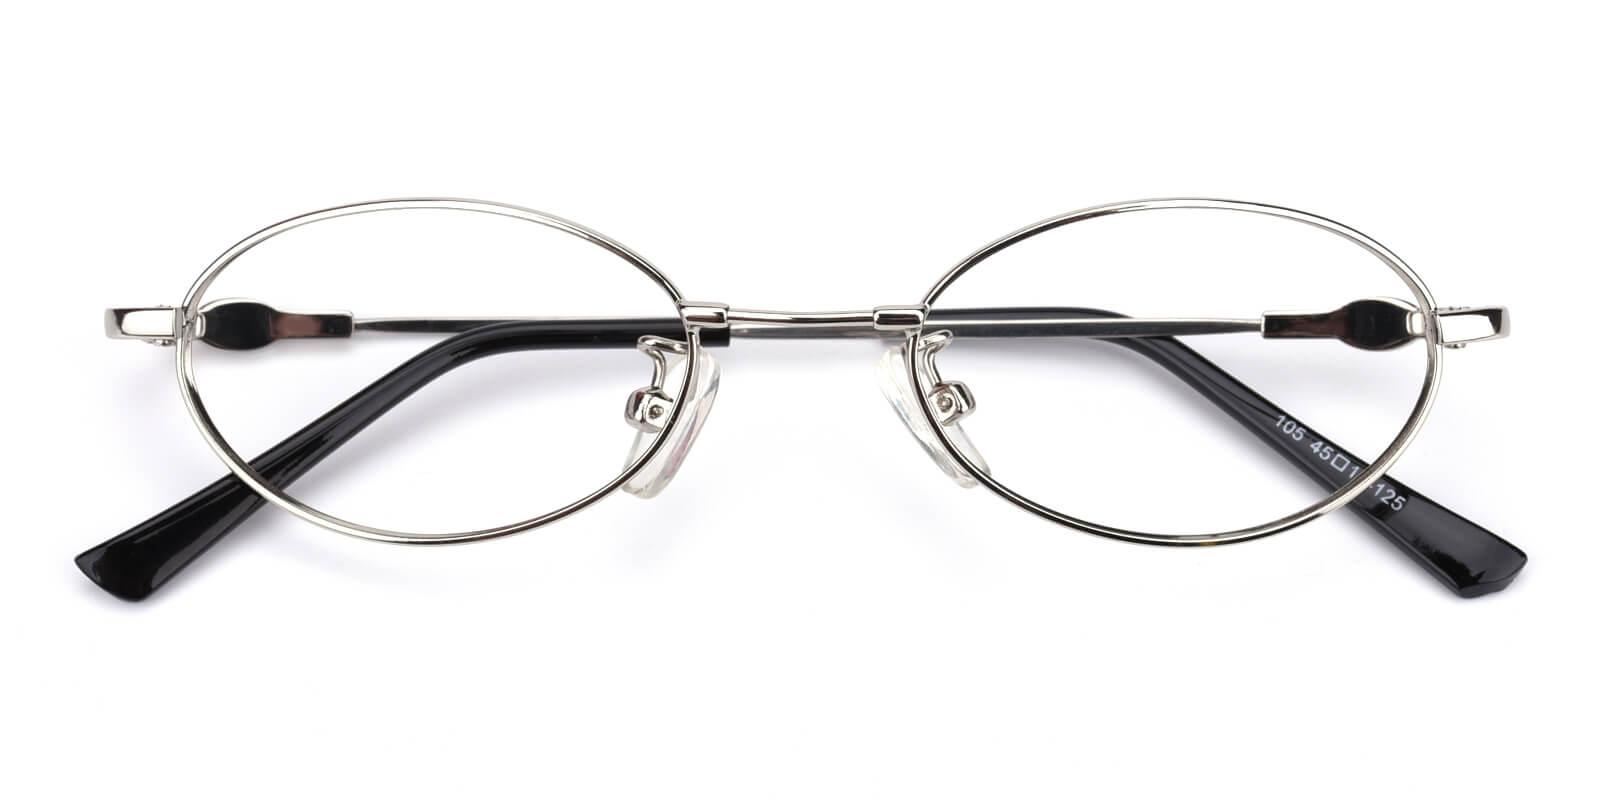 Mikestar-Silver-Oval-Titanium-Eyeglasses-detail